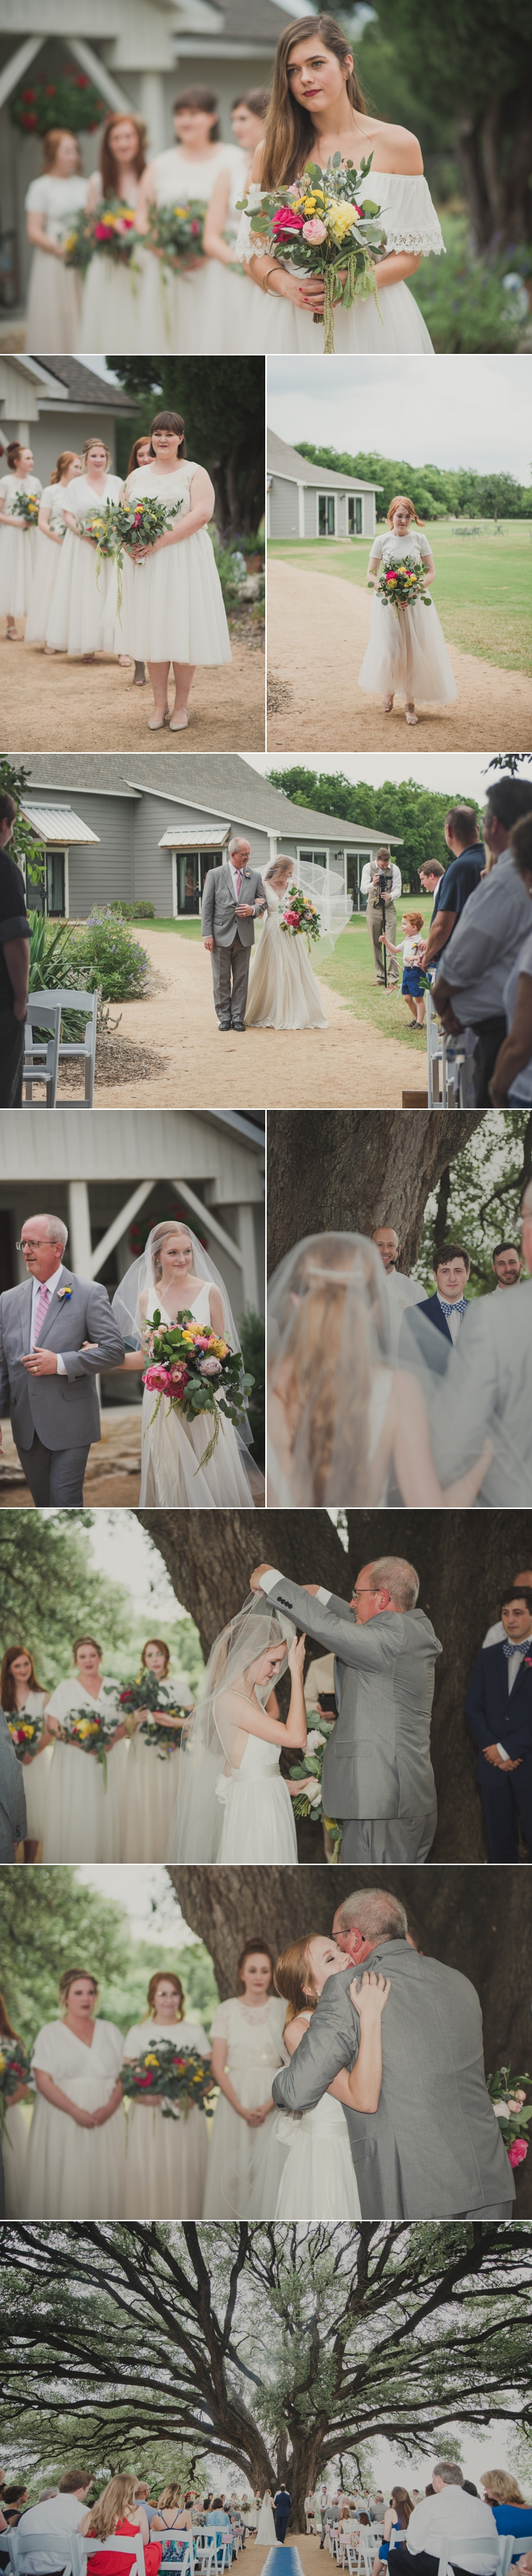 destination-wedding-photographers-ej 31.jpg